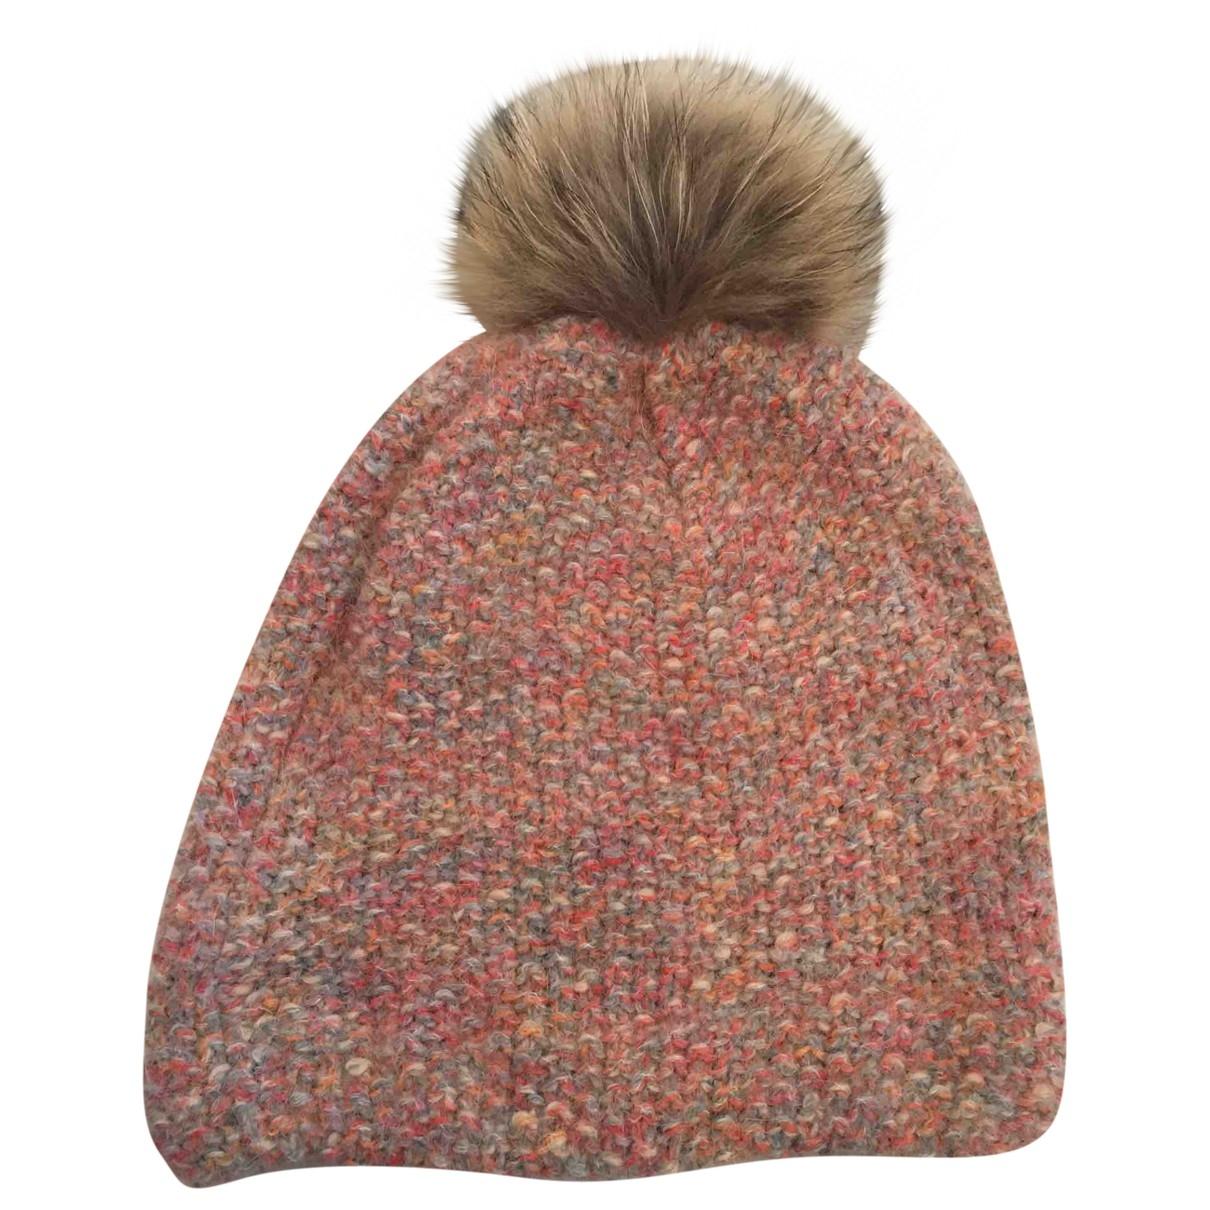 Inverni \N Pink Wool hat for Women M International